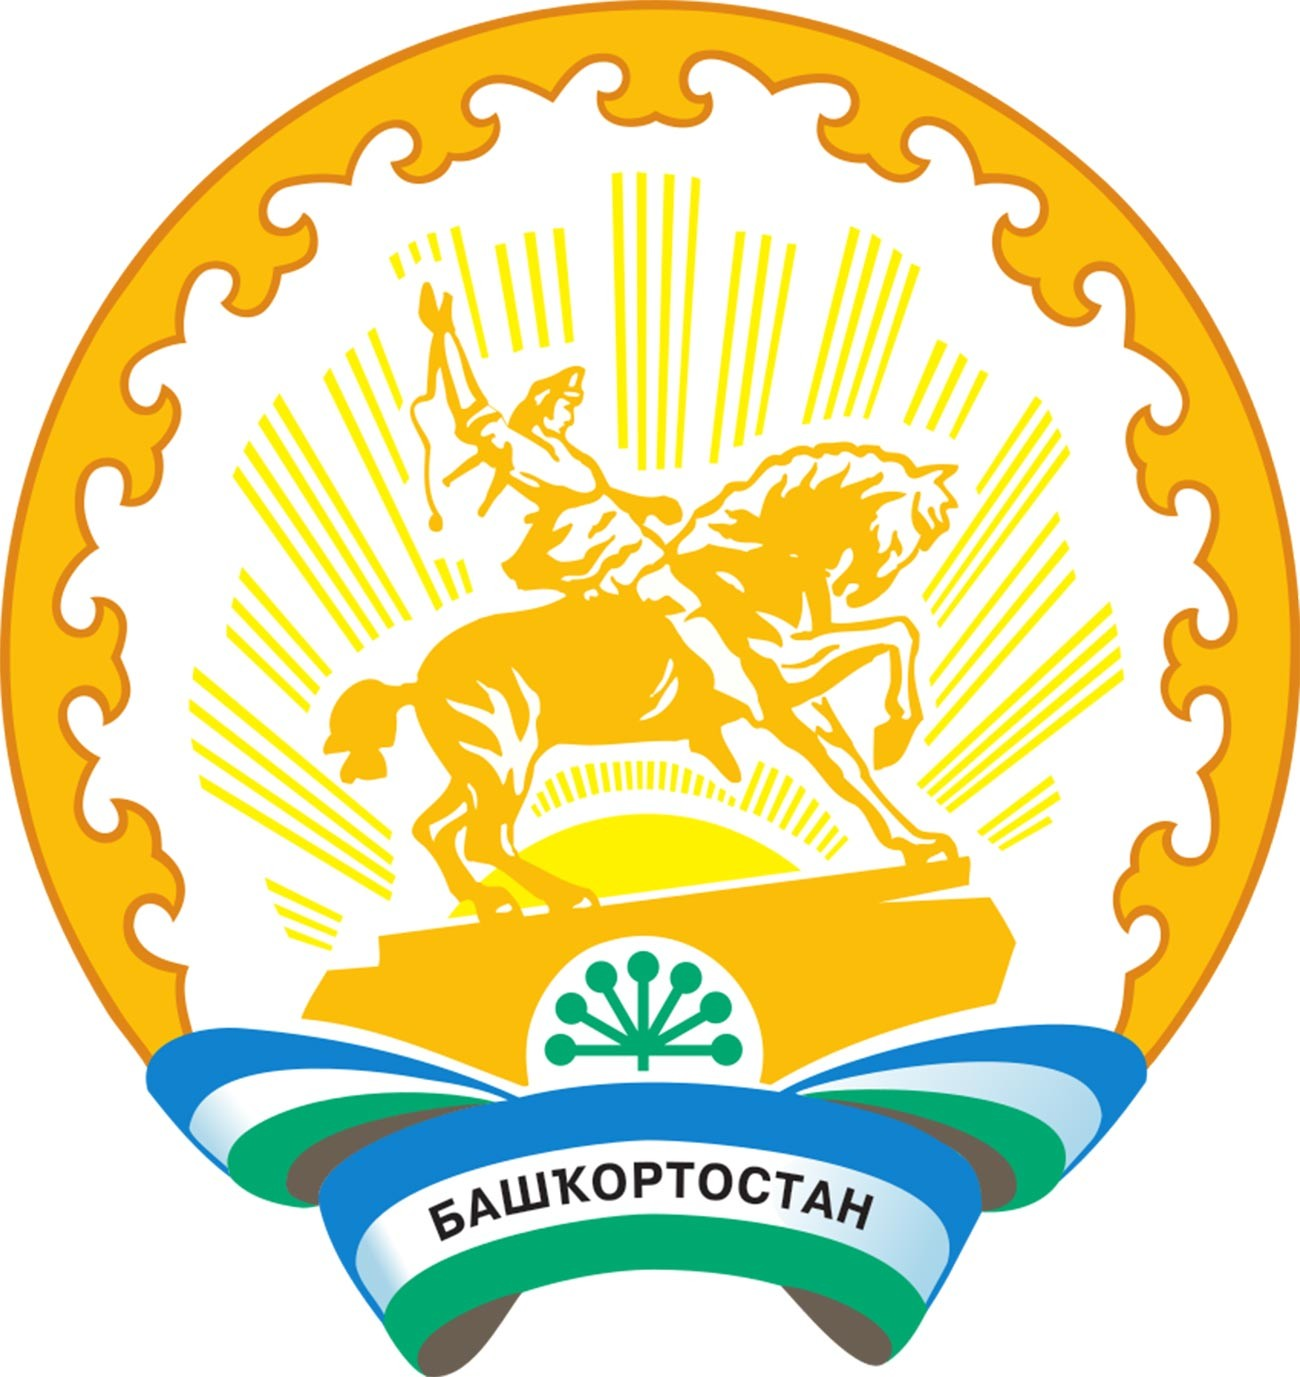 The official emblem of the Republic of Bashkortostan